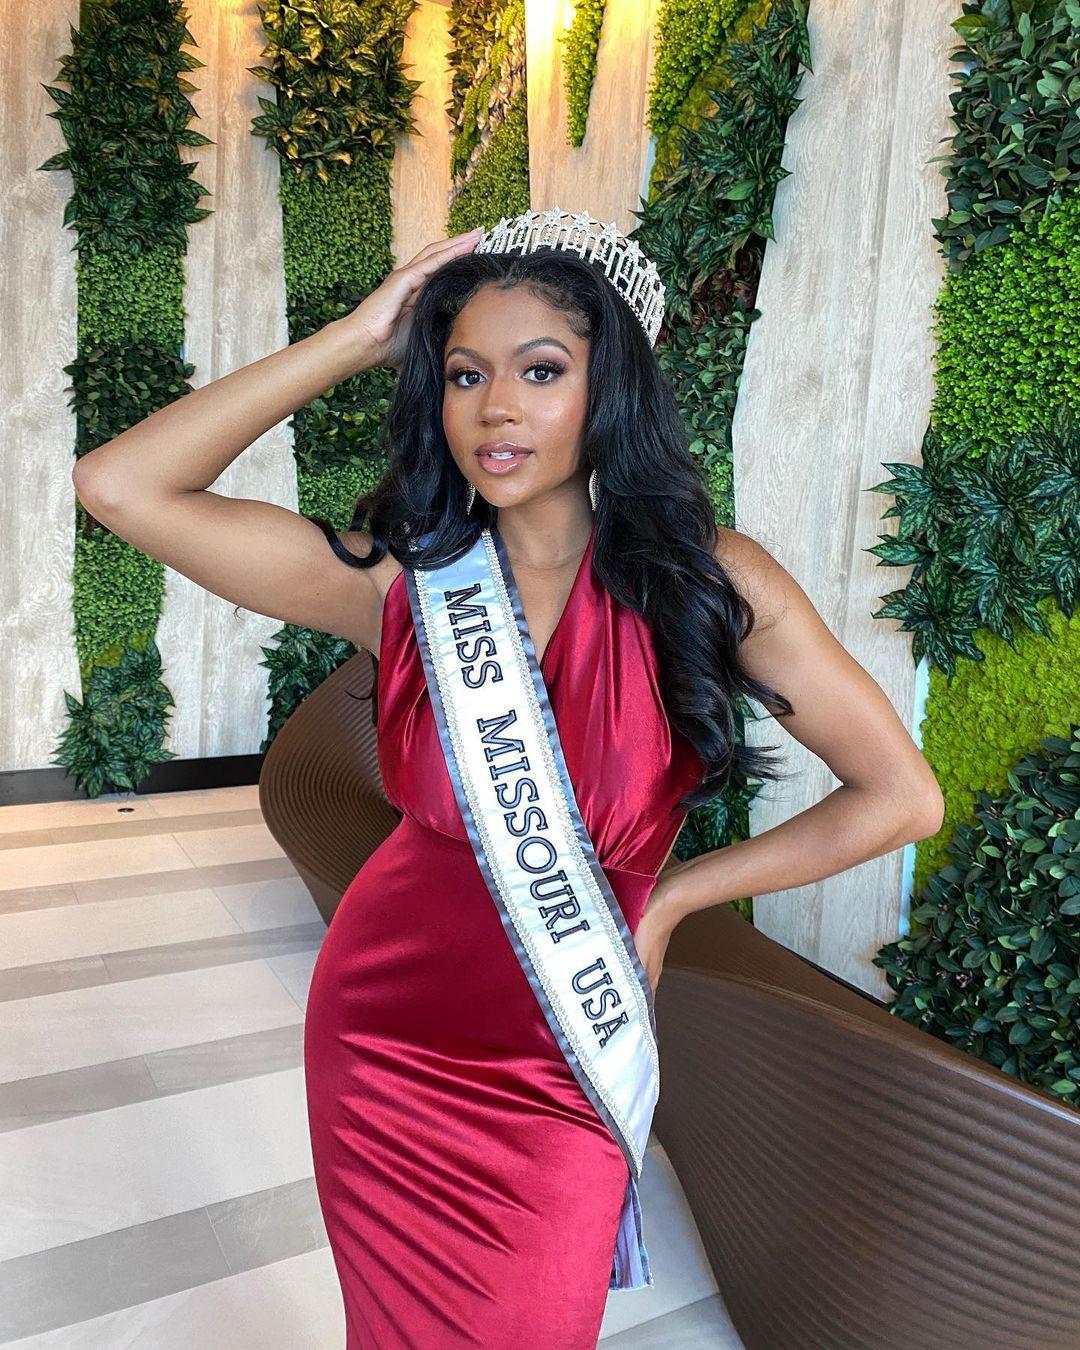 candidatas a miss usa 2021. final: 29 nov. sede: oklahoma. - Página 2 RVB0DF